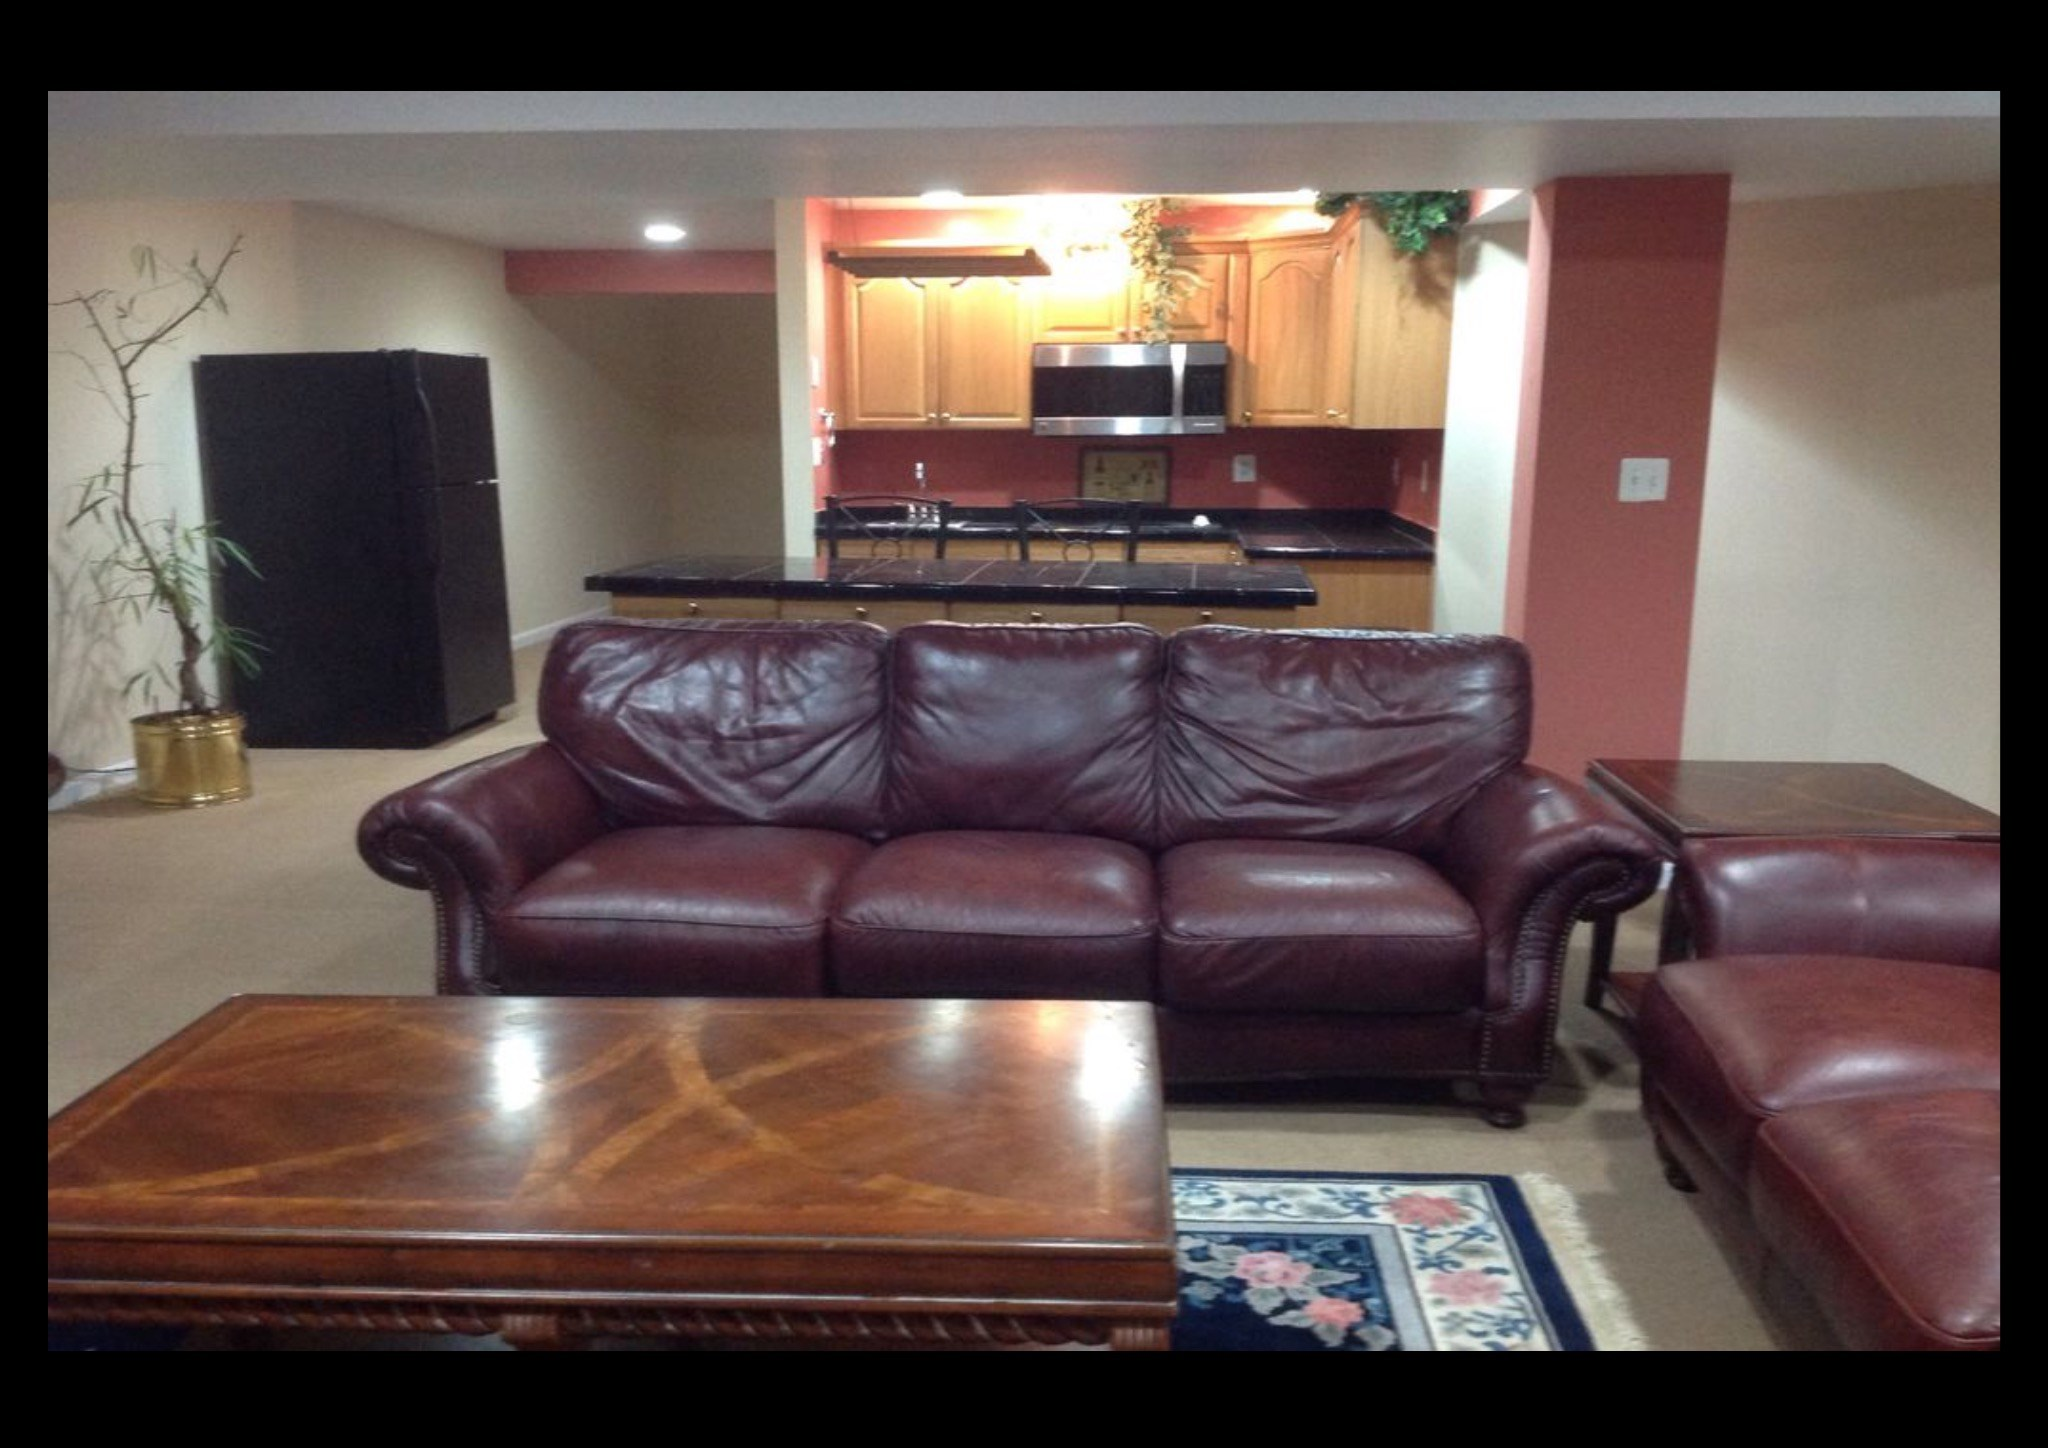 Luxury Basement | 1 BHK Basement Apartment in Chantilly, VA | 1077375 -  Sulekha Rentals